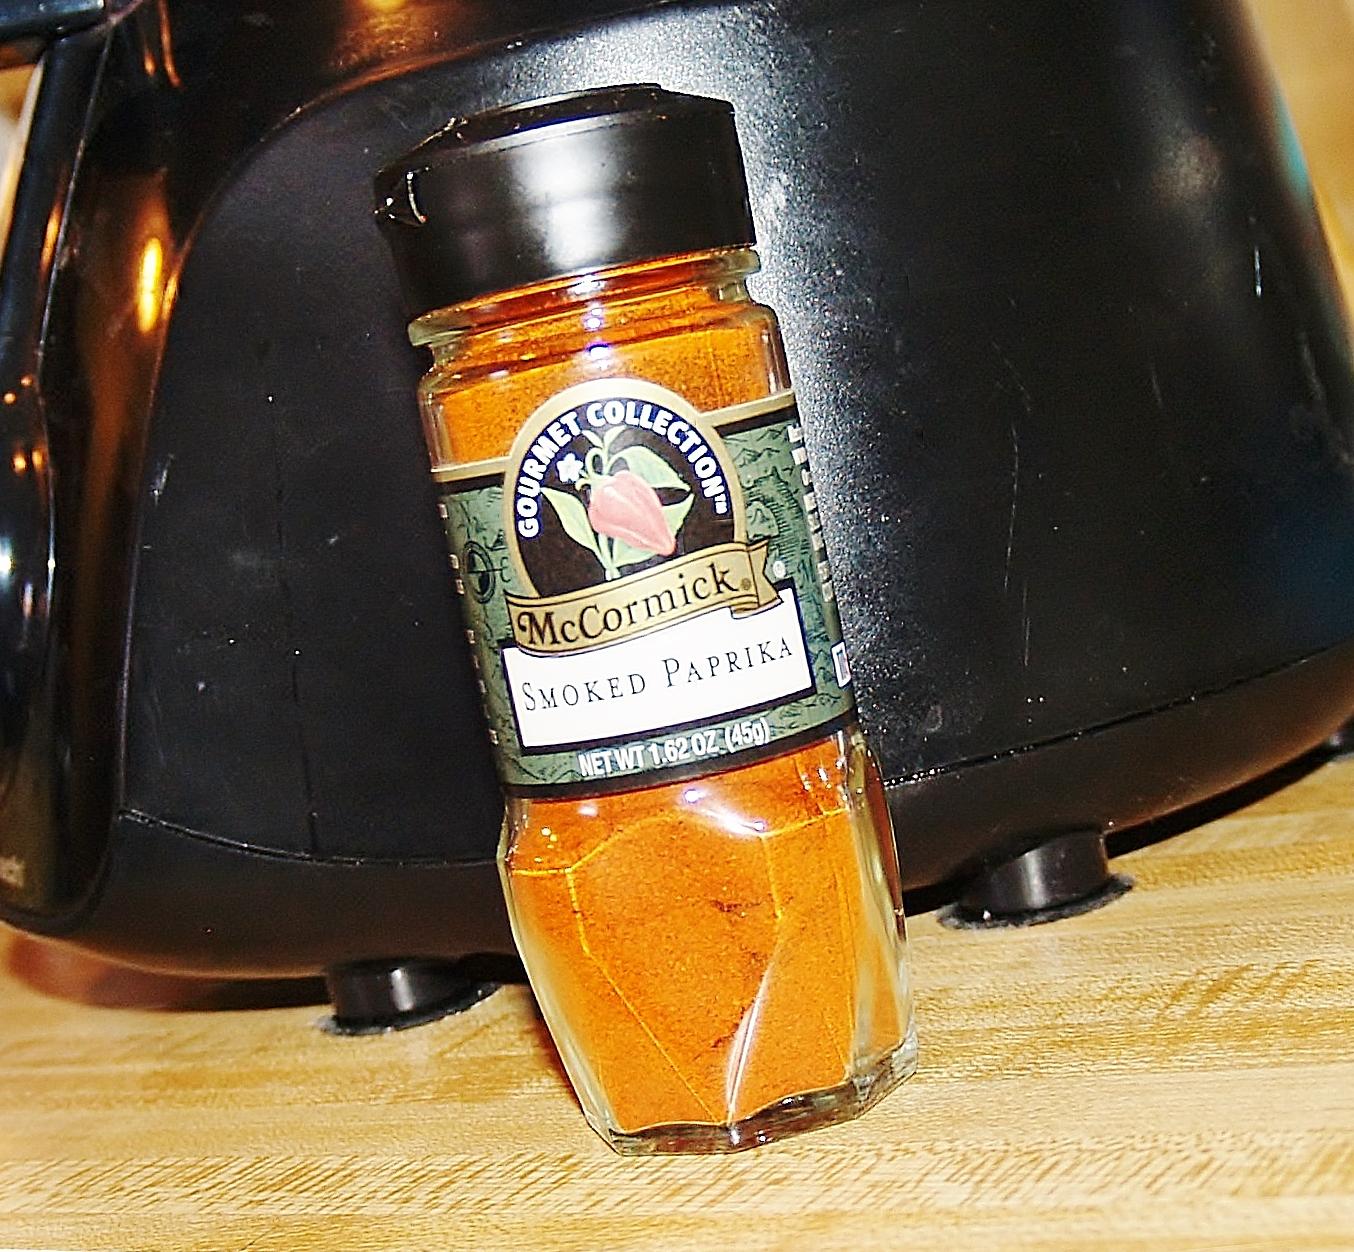 McCormick's Smoked Paprika